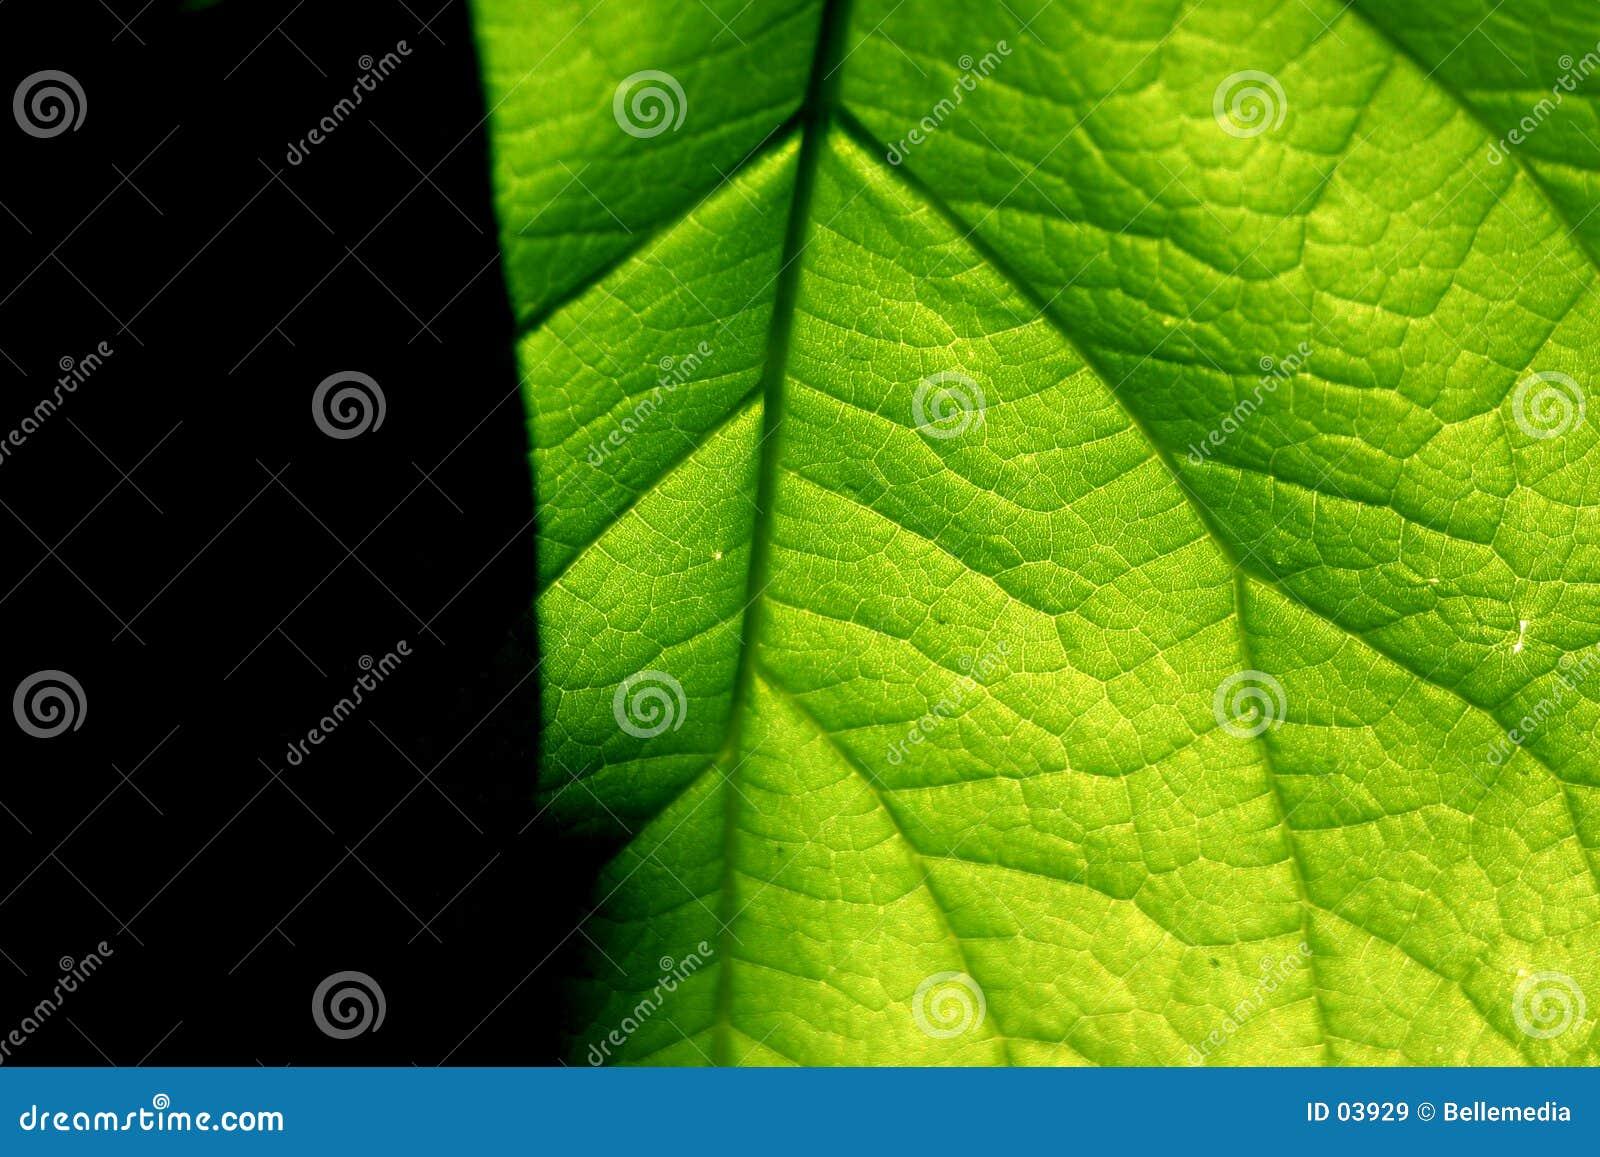 Green contrast